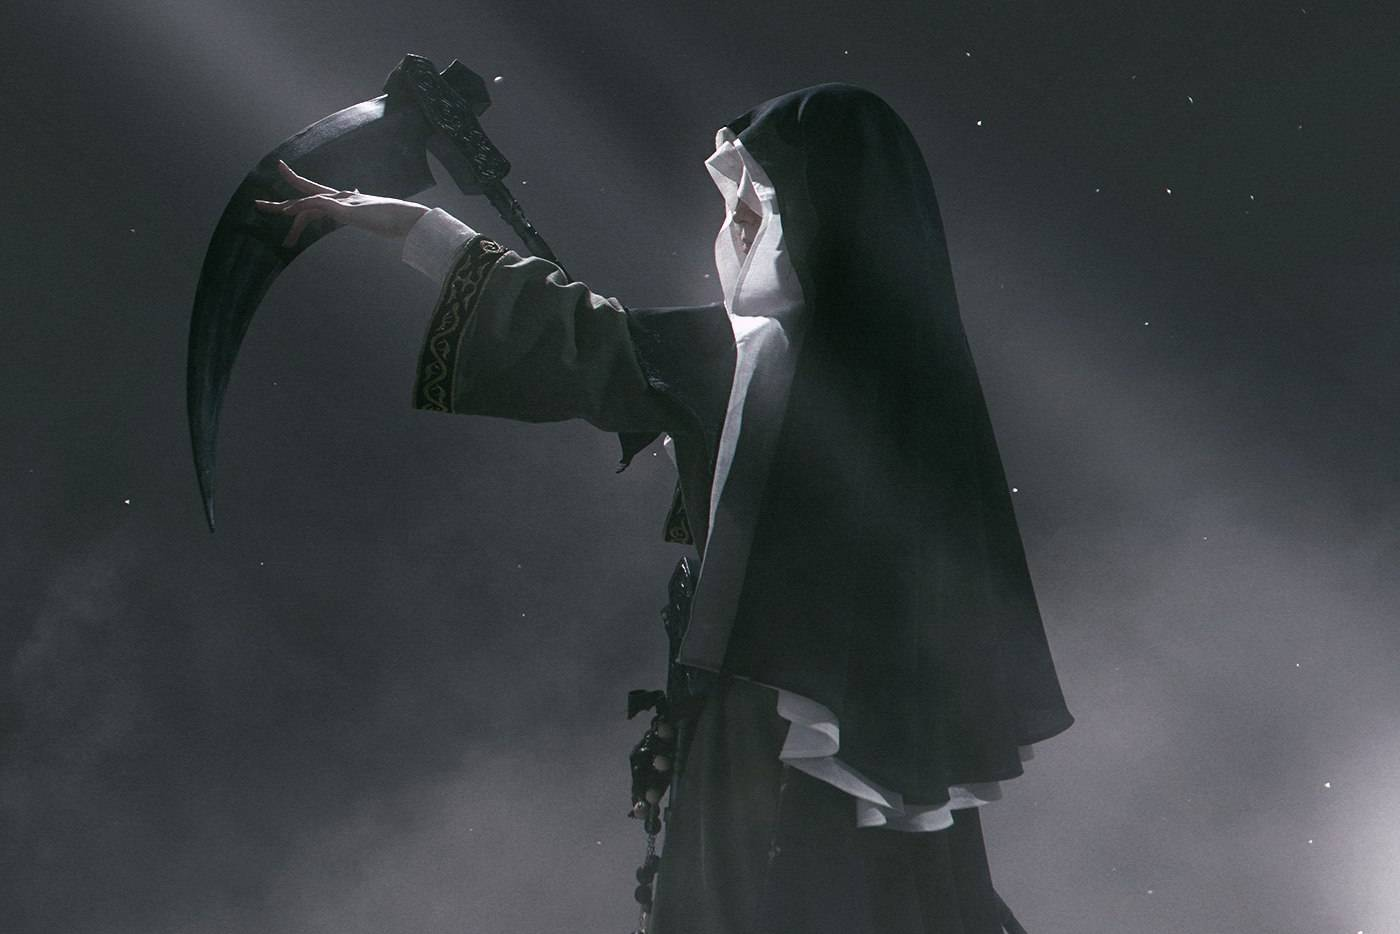 Лучший косплей: Darkest Dungeon и Dark Souls 3